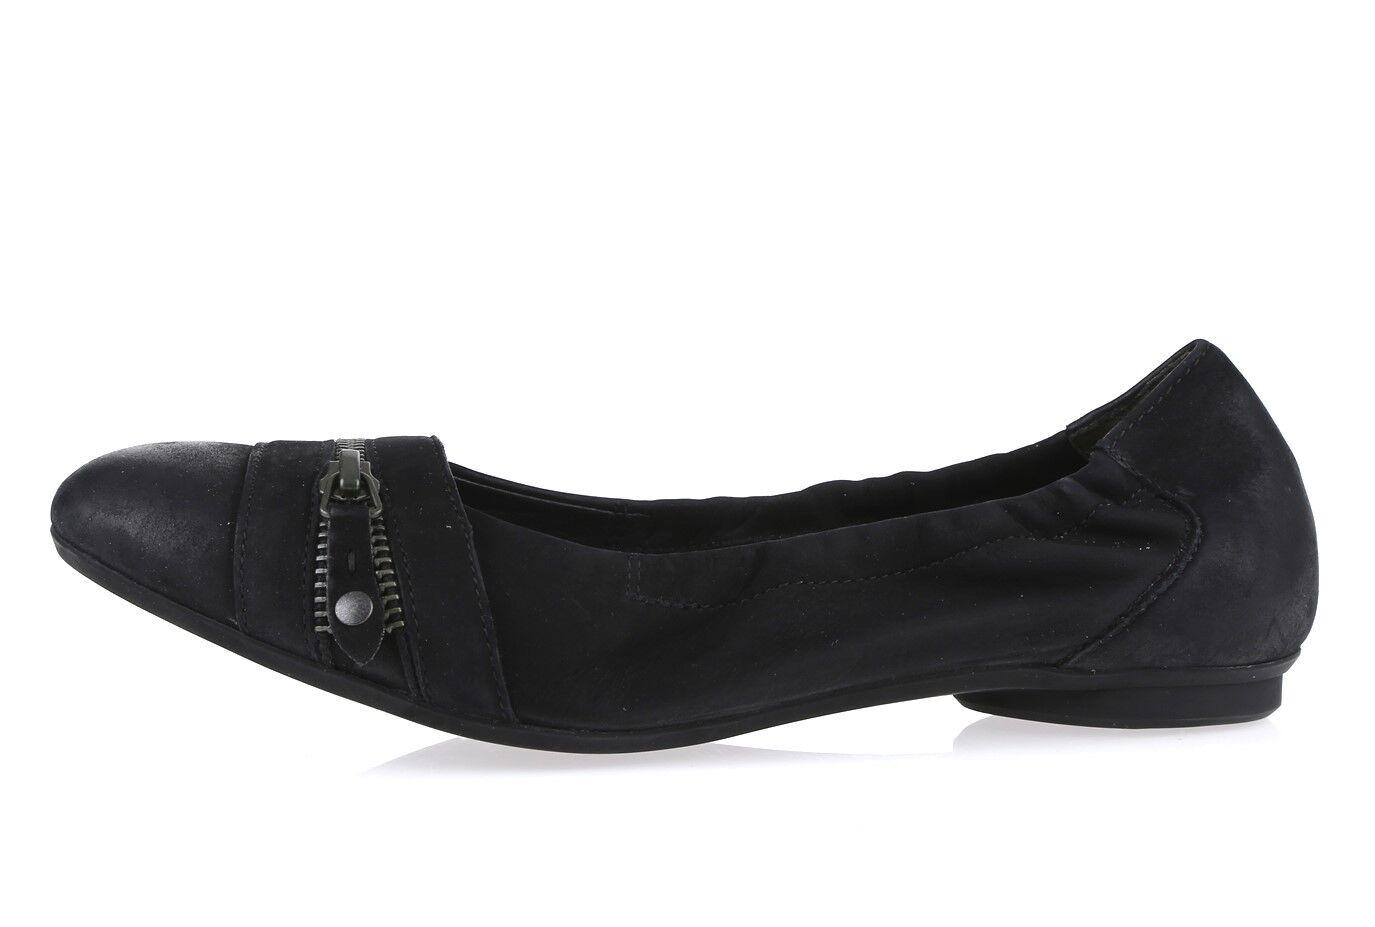 Womens PAUL GREEN 203958 black black black leather ballet flats sz. UK 4 NEW 7c75e6